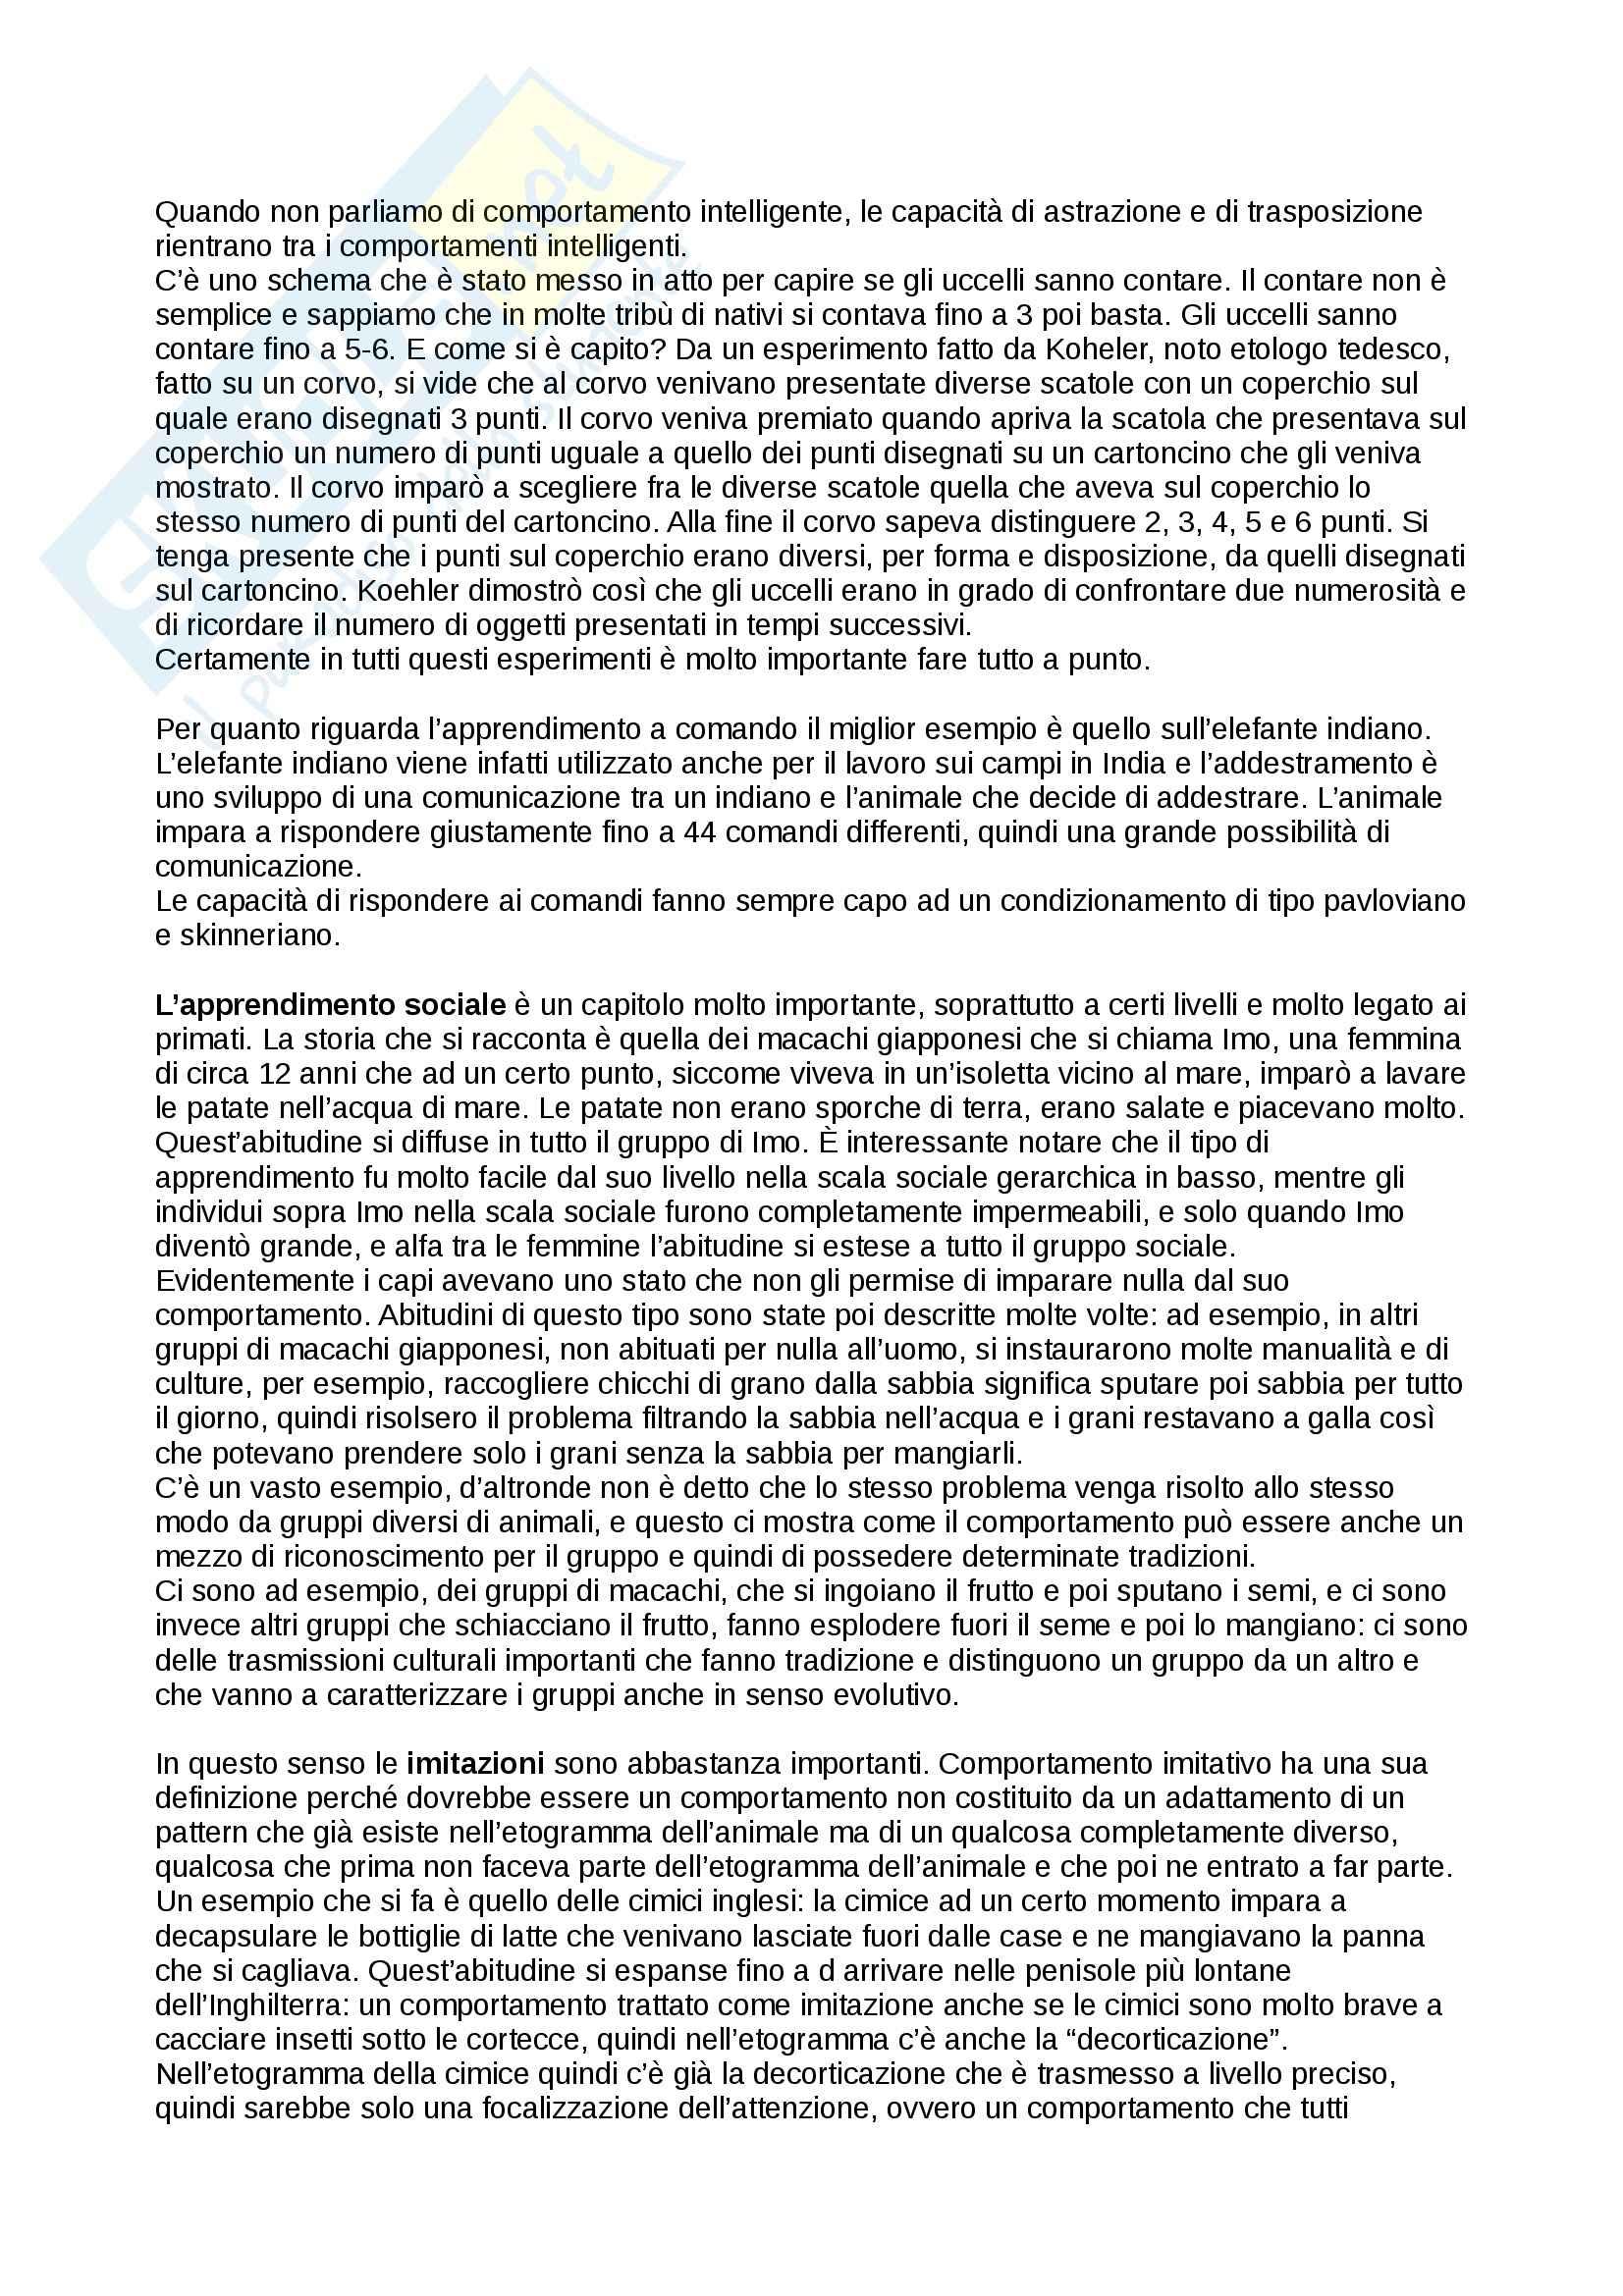 Apprendimento, Etologia Pag. 6